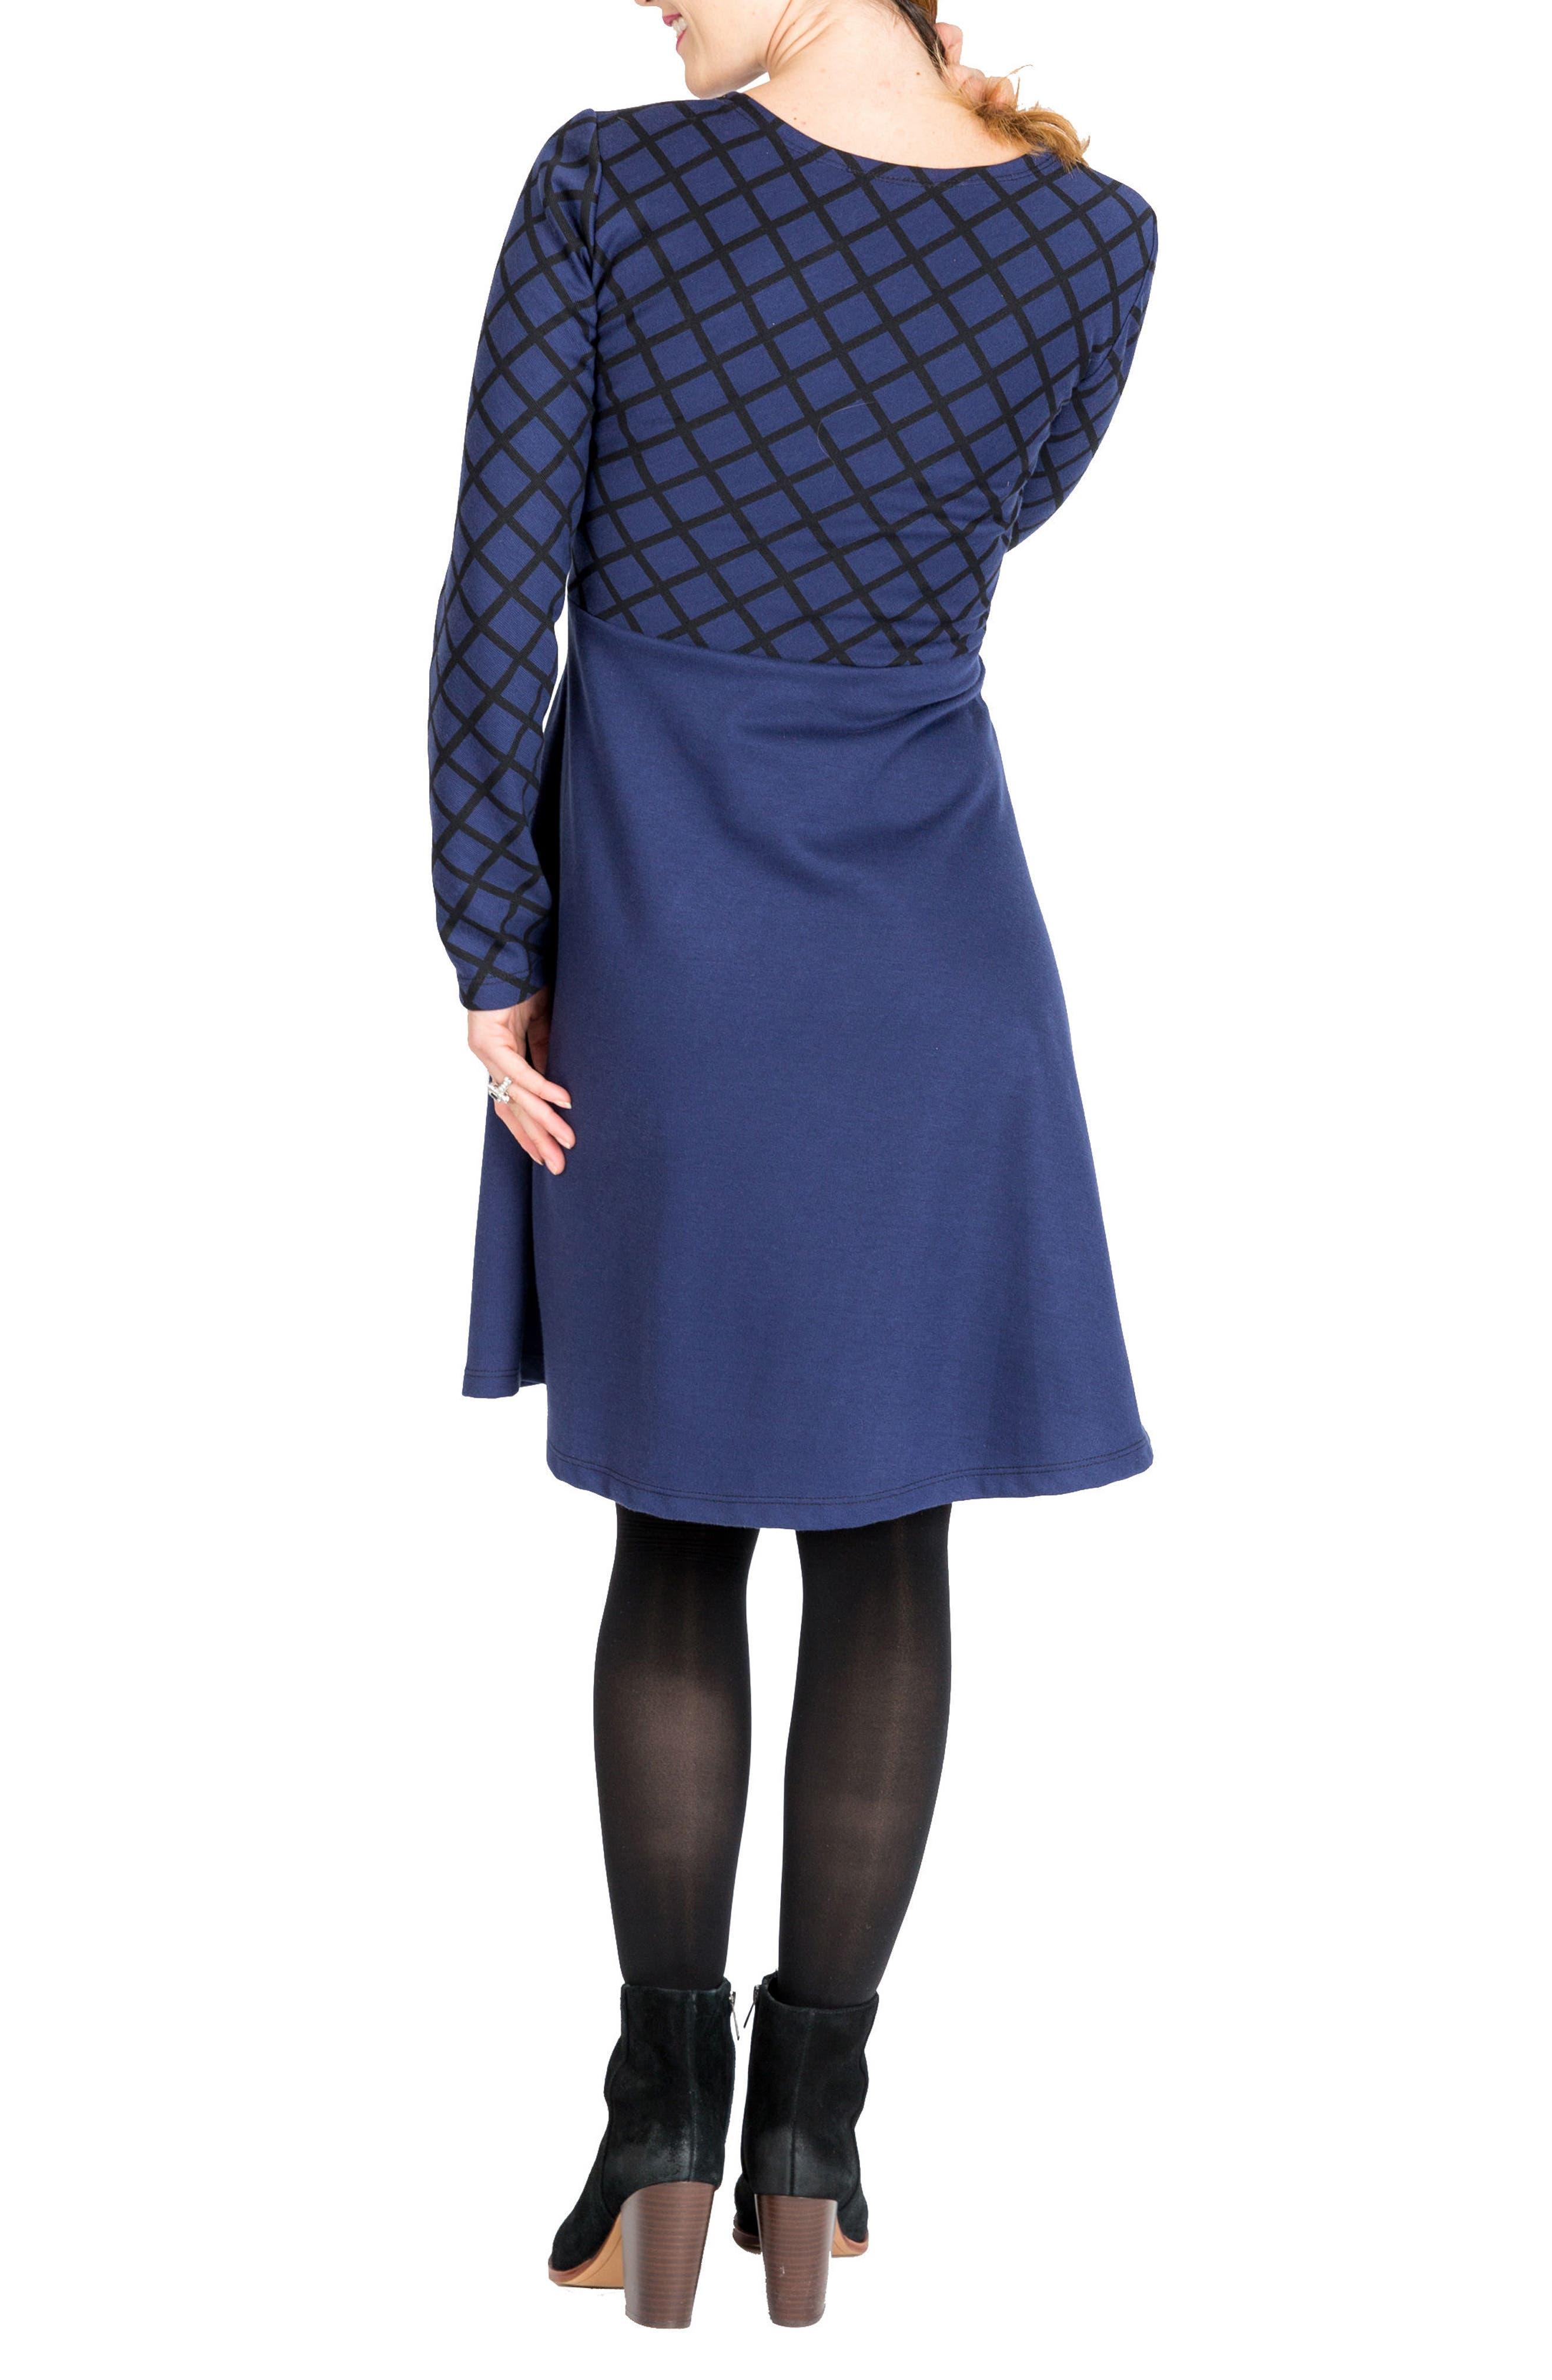 NOM MATERNITY,                             Emma Print Overlay Maternity/Nursing Dress,                             Alternate thumbnail 2, color,                             400